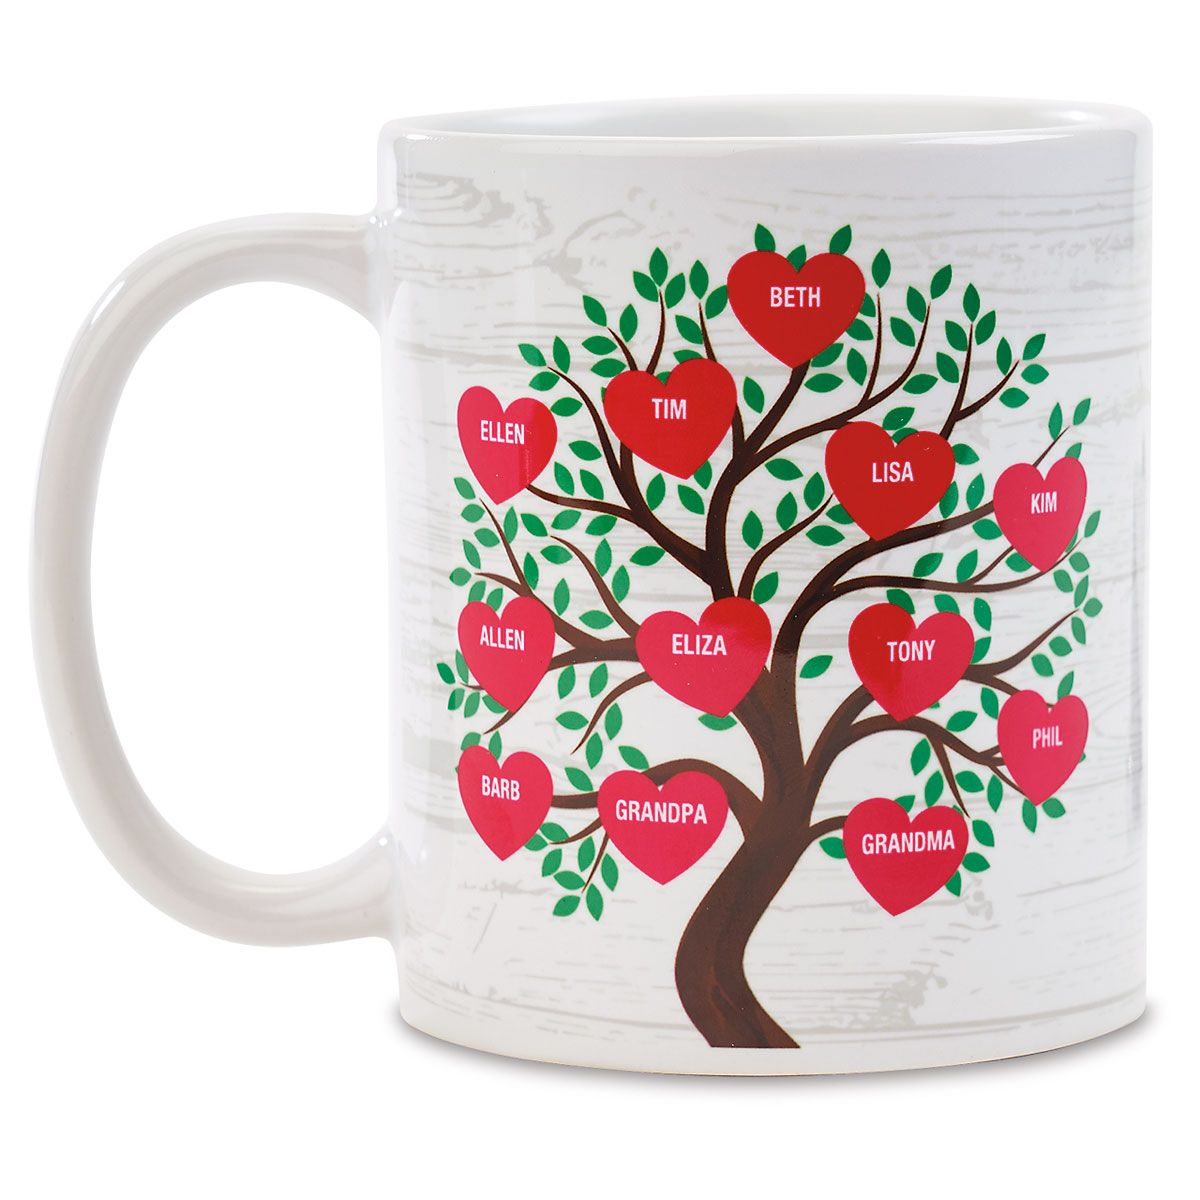 Family Tree Personalized Mug